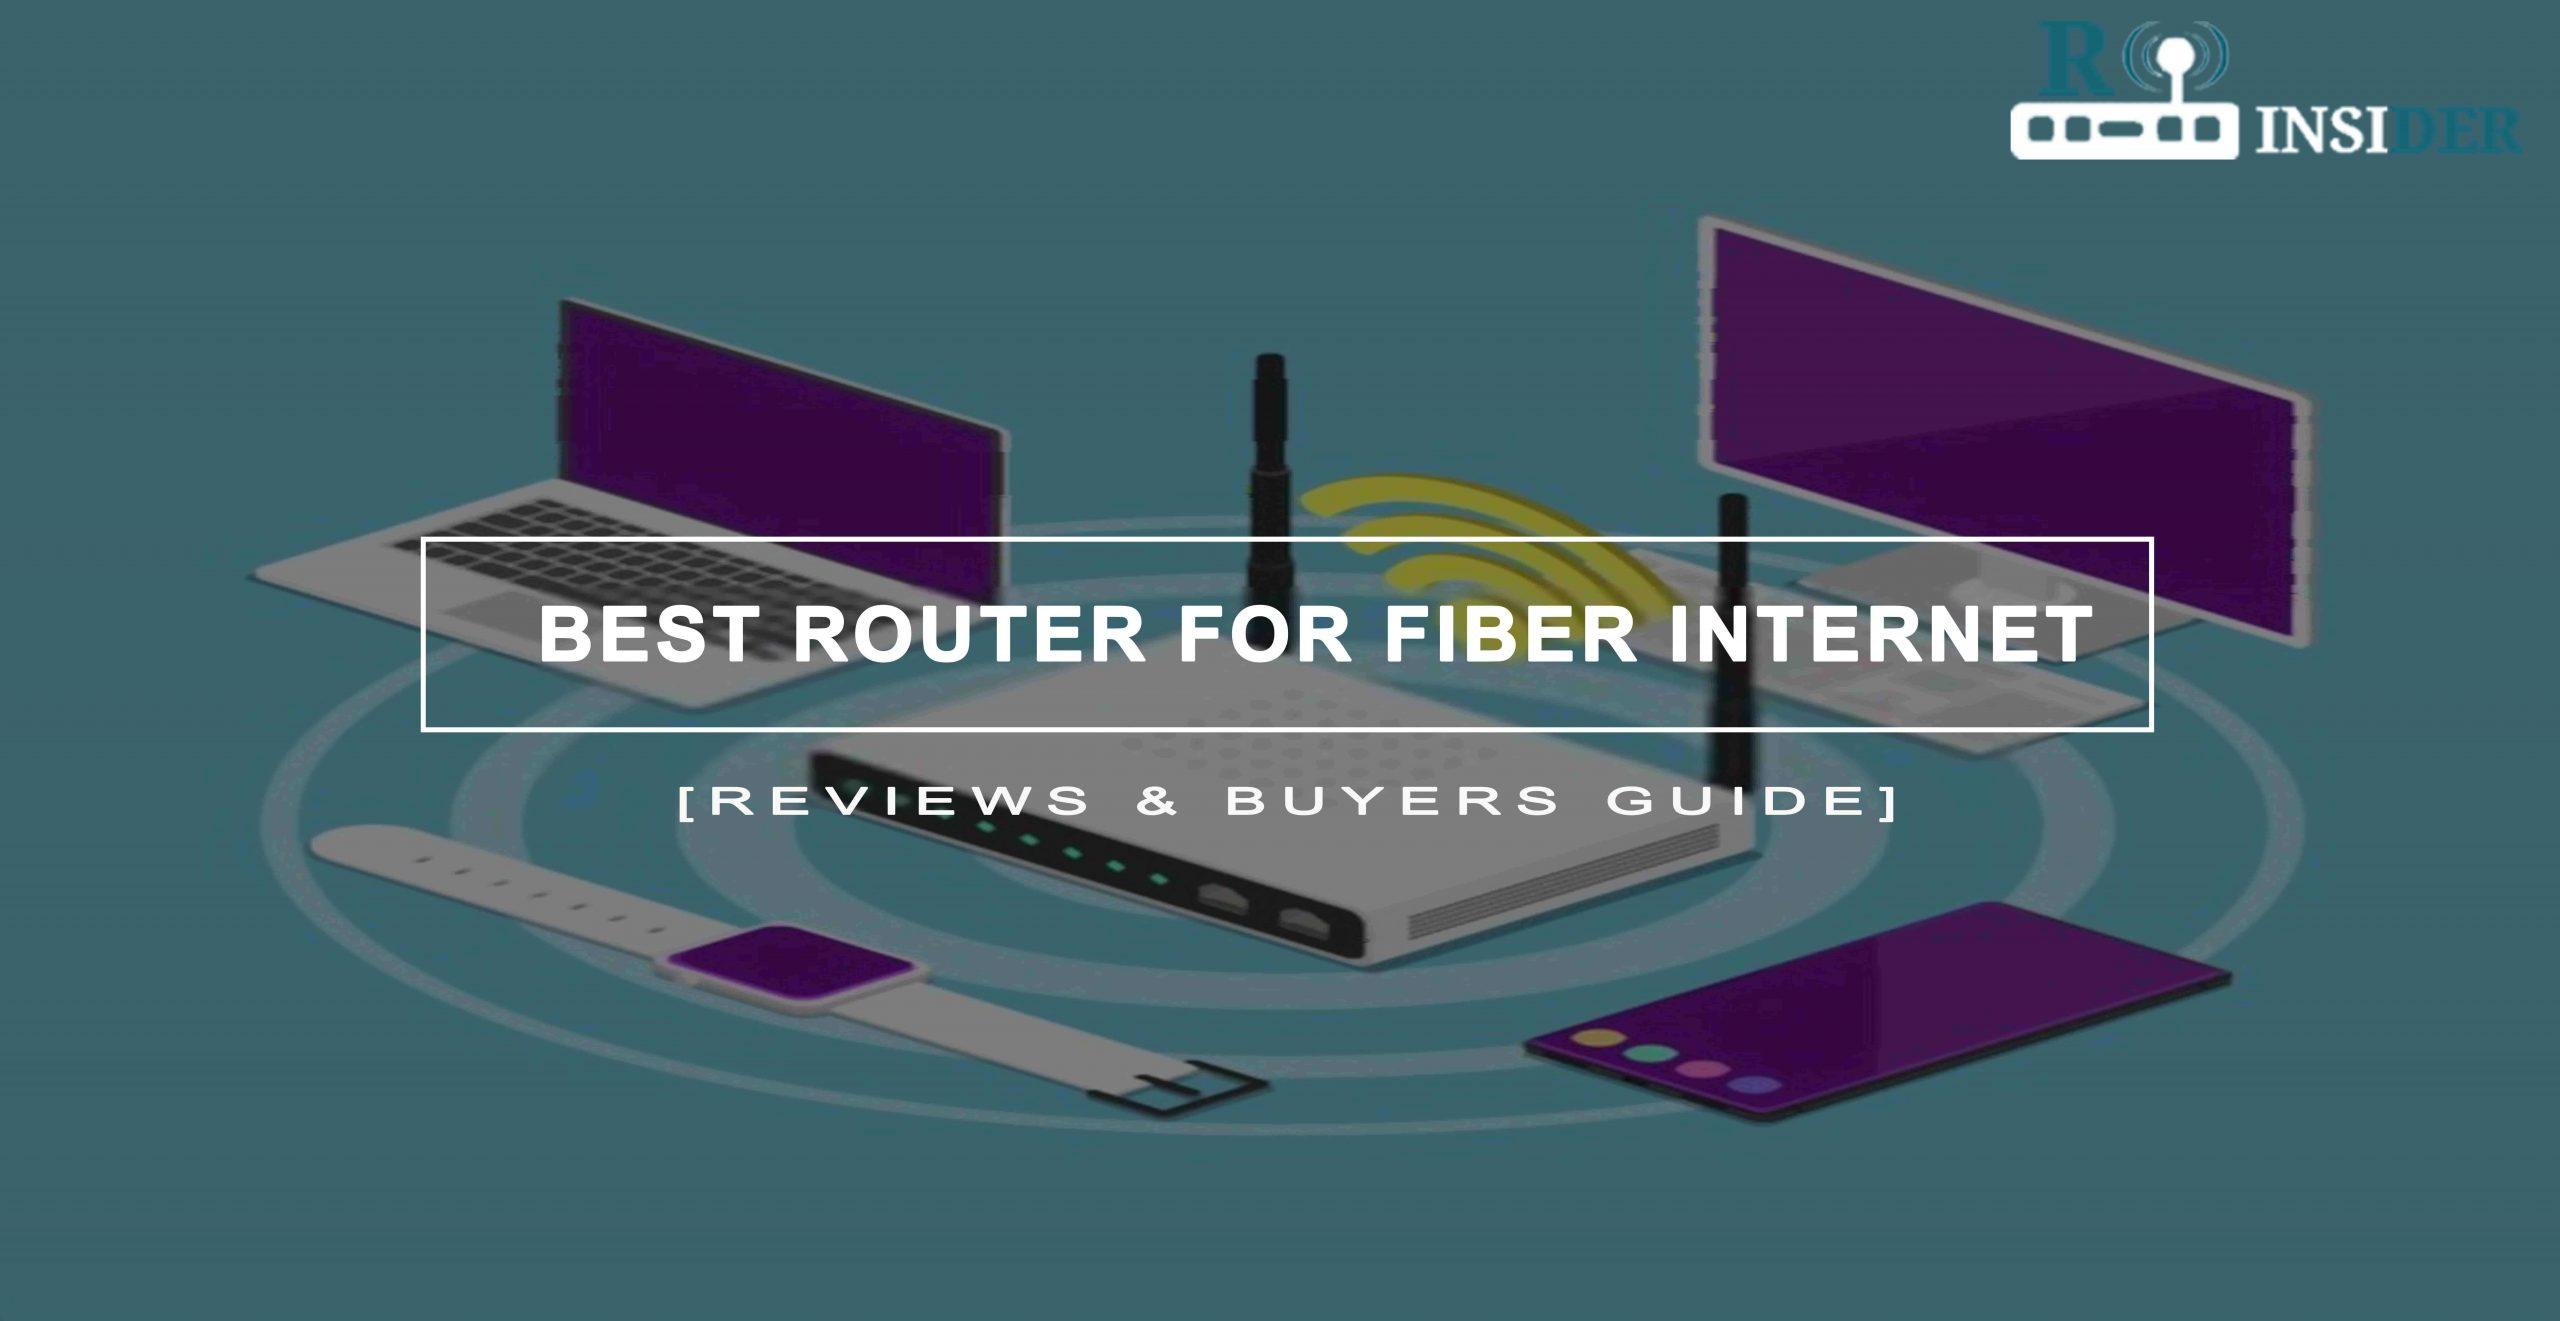 Best Router For Fiber Internet